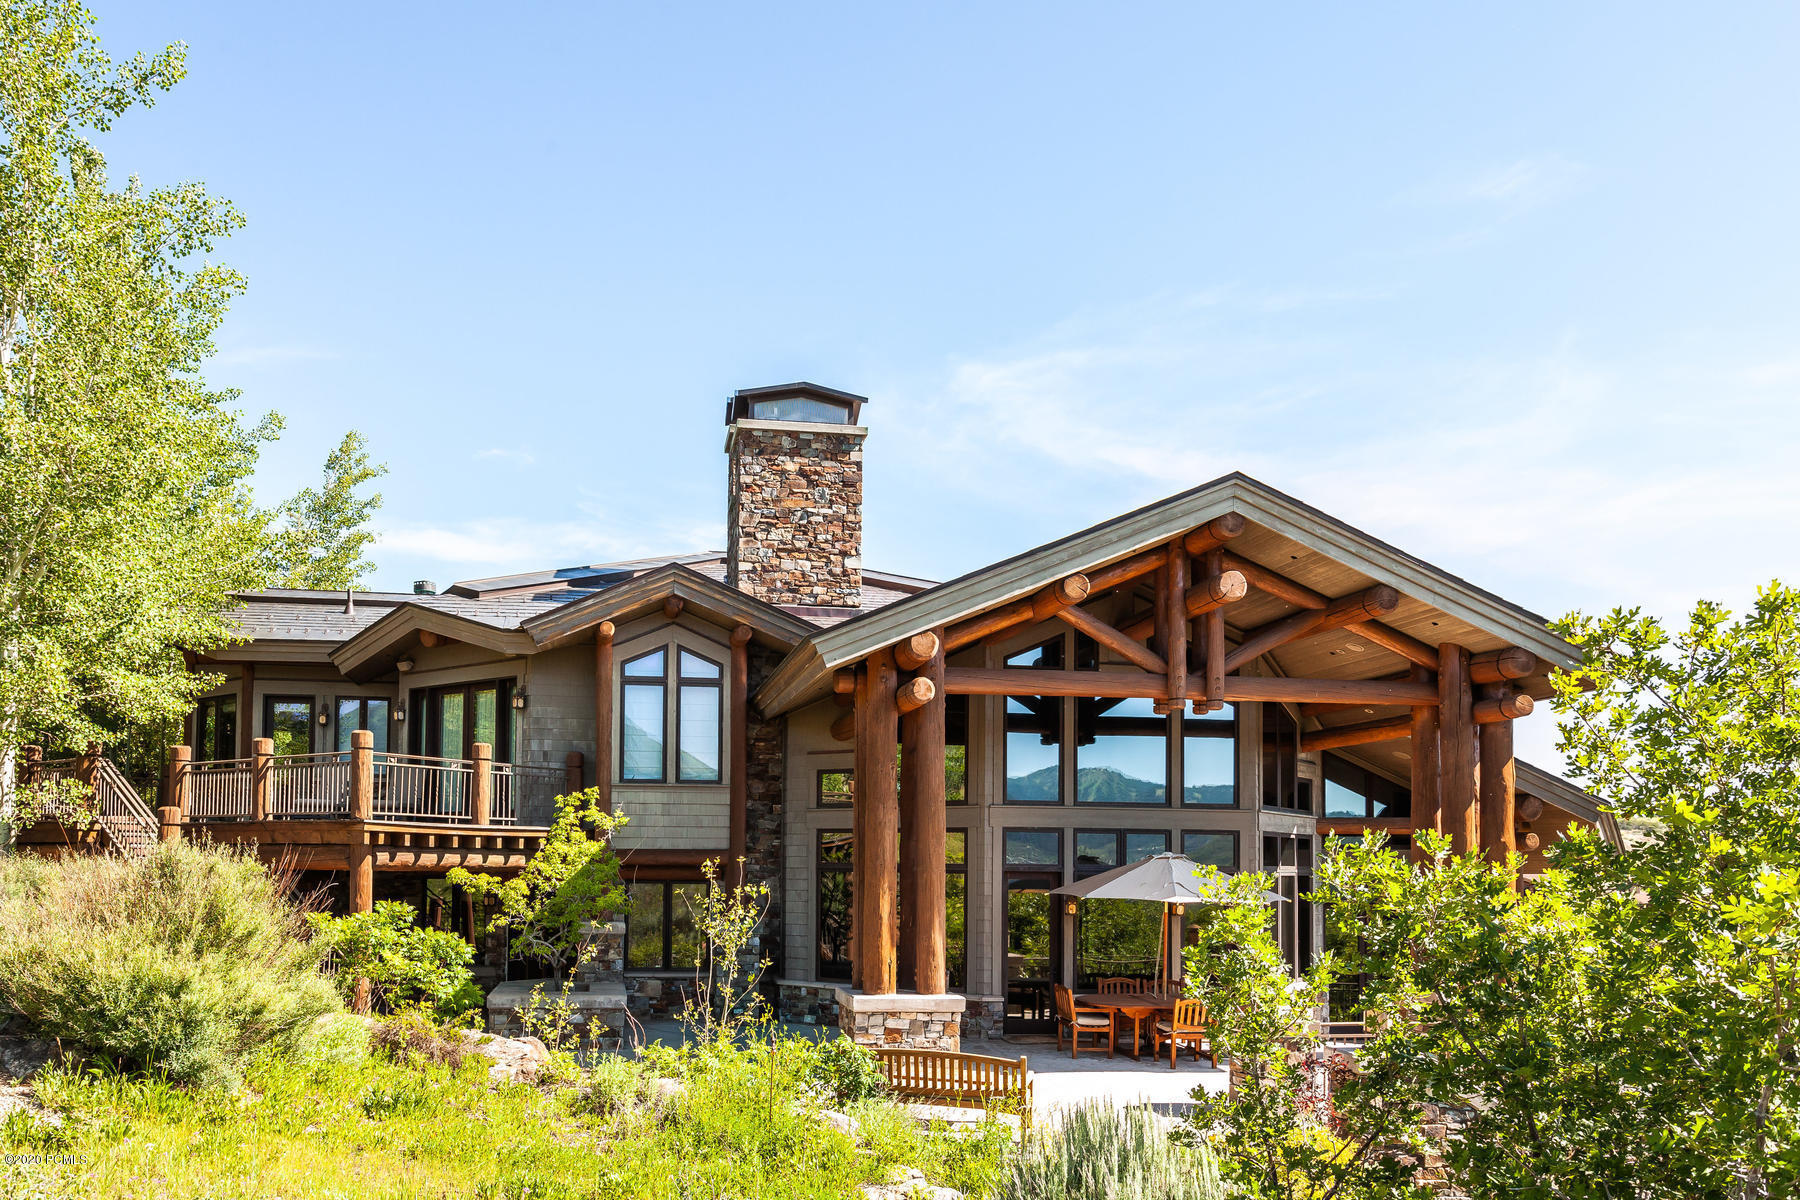 34 Sandstone Cove, Park City, Utah 84060, 5 Bedrooms Bedrooms, ,8 BathroomsBathrooms,Single Family,For Sale,Sandstone,20190109112430415765000000